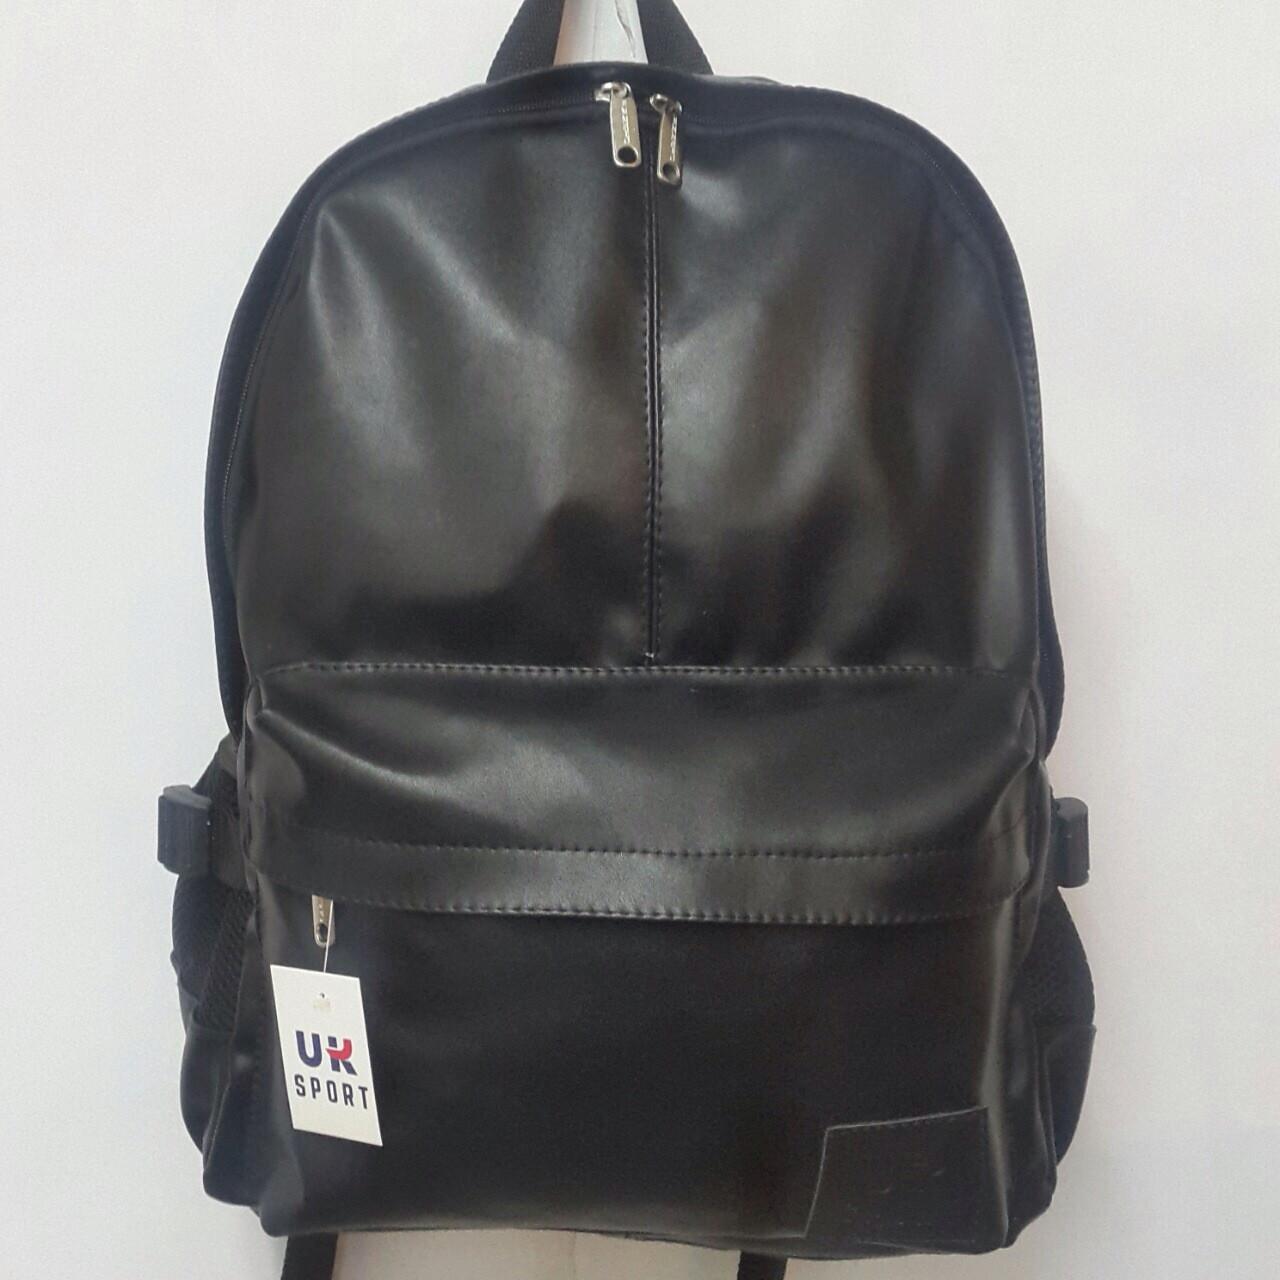 fb0f556b3a9e Спортивный рюкзак из экокожи черный: продажа, цена в Харькове ...